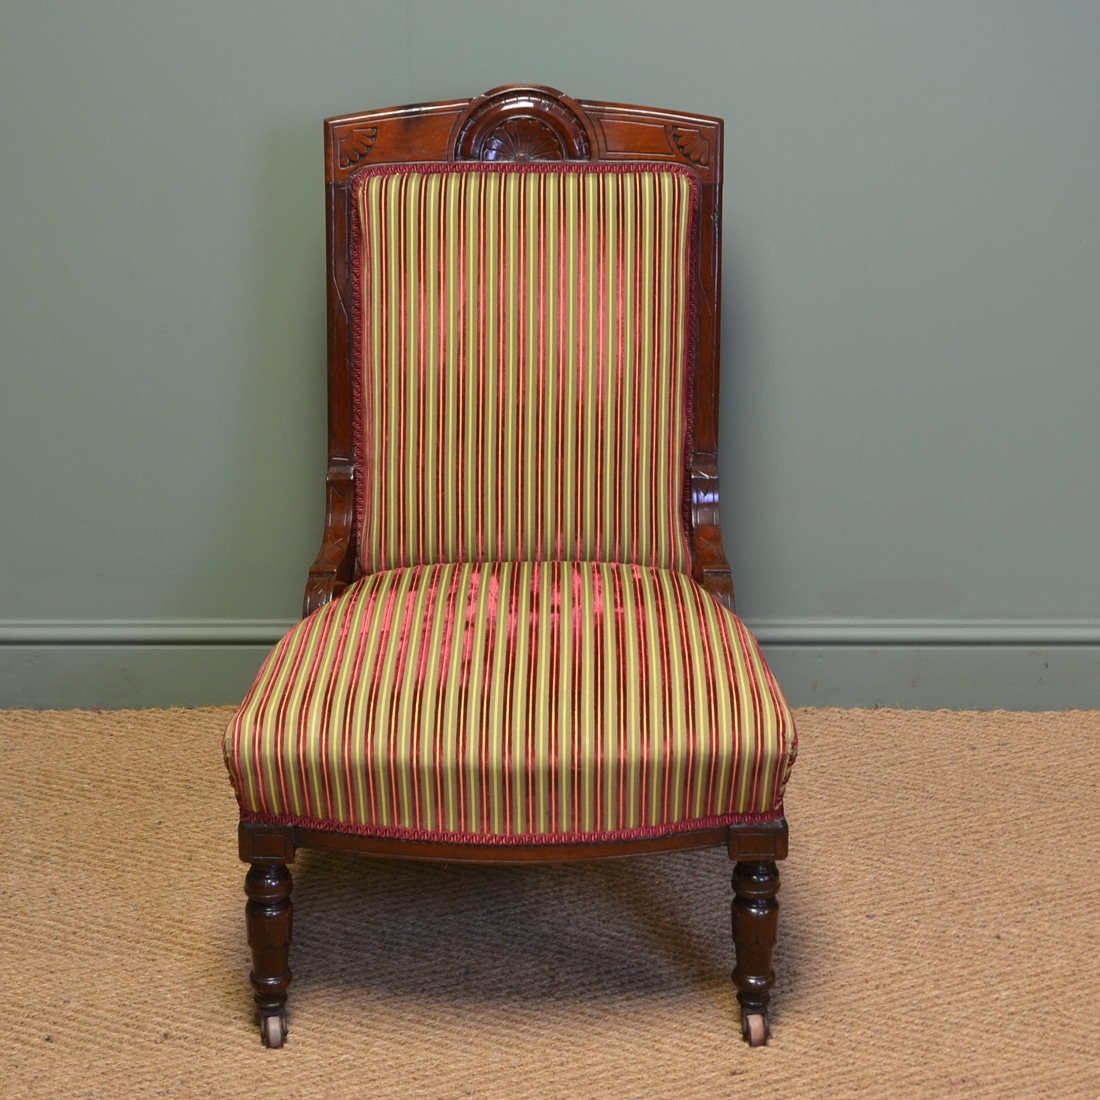 Striking Victorian Walnut Upholstered Antique Ladies Chair - Striking Victorian Walnut Upholstered Antique Ladies Chair